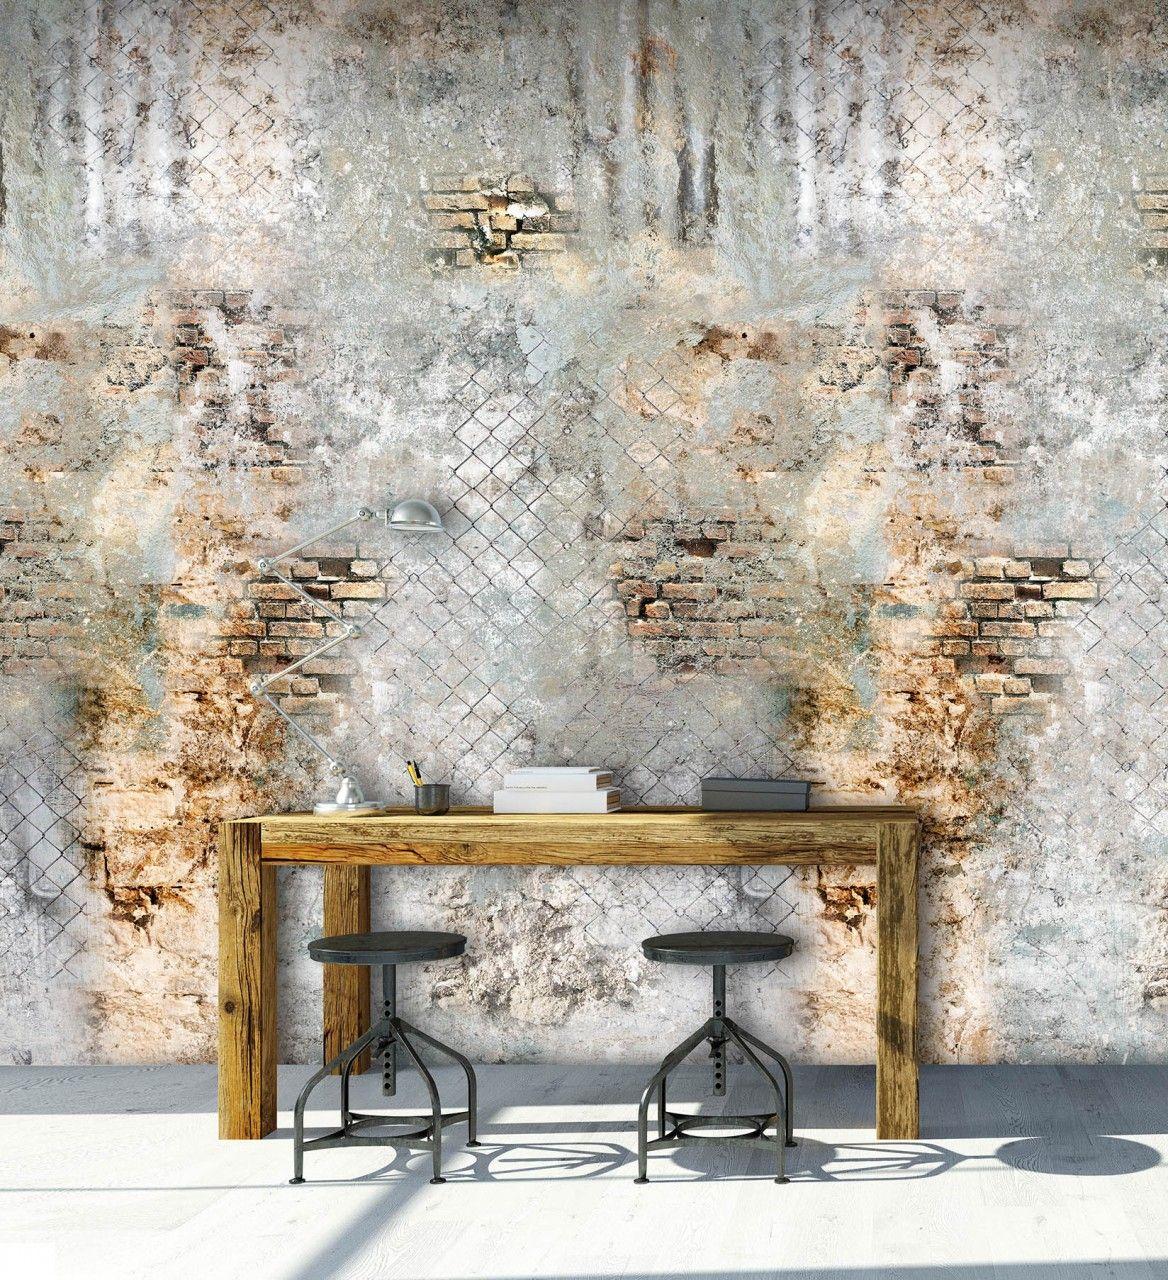 85 Wohnzimmer Tapeten Ideen: Vlies Fototapete Steinwand Antik Ornament Mediteran